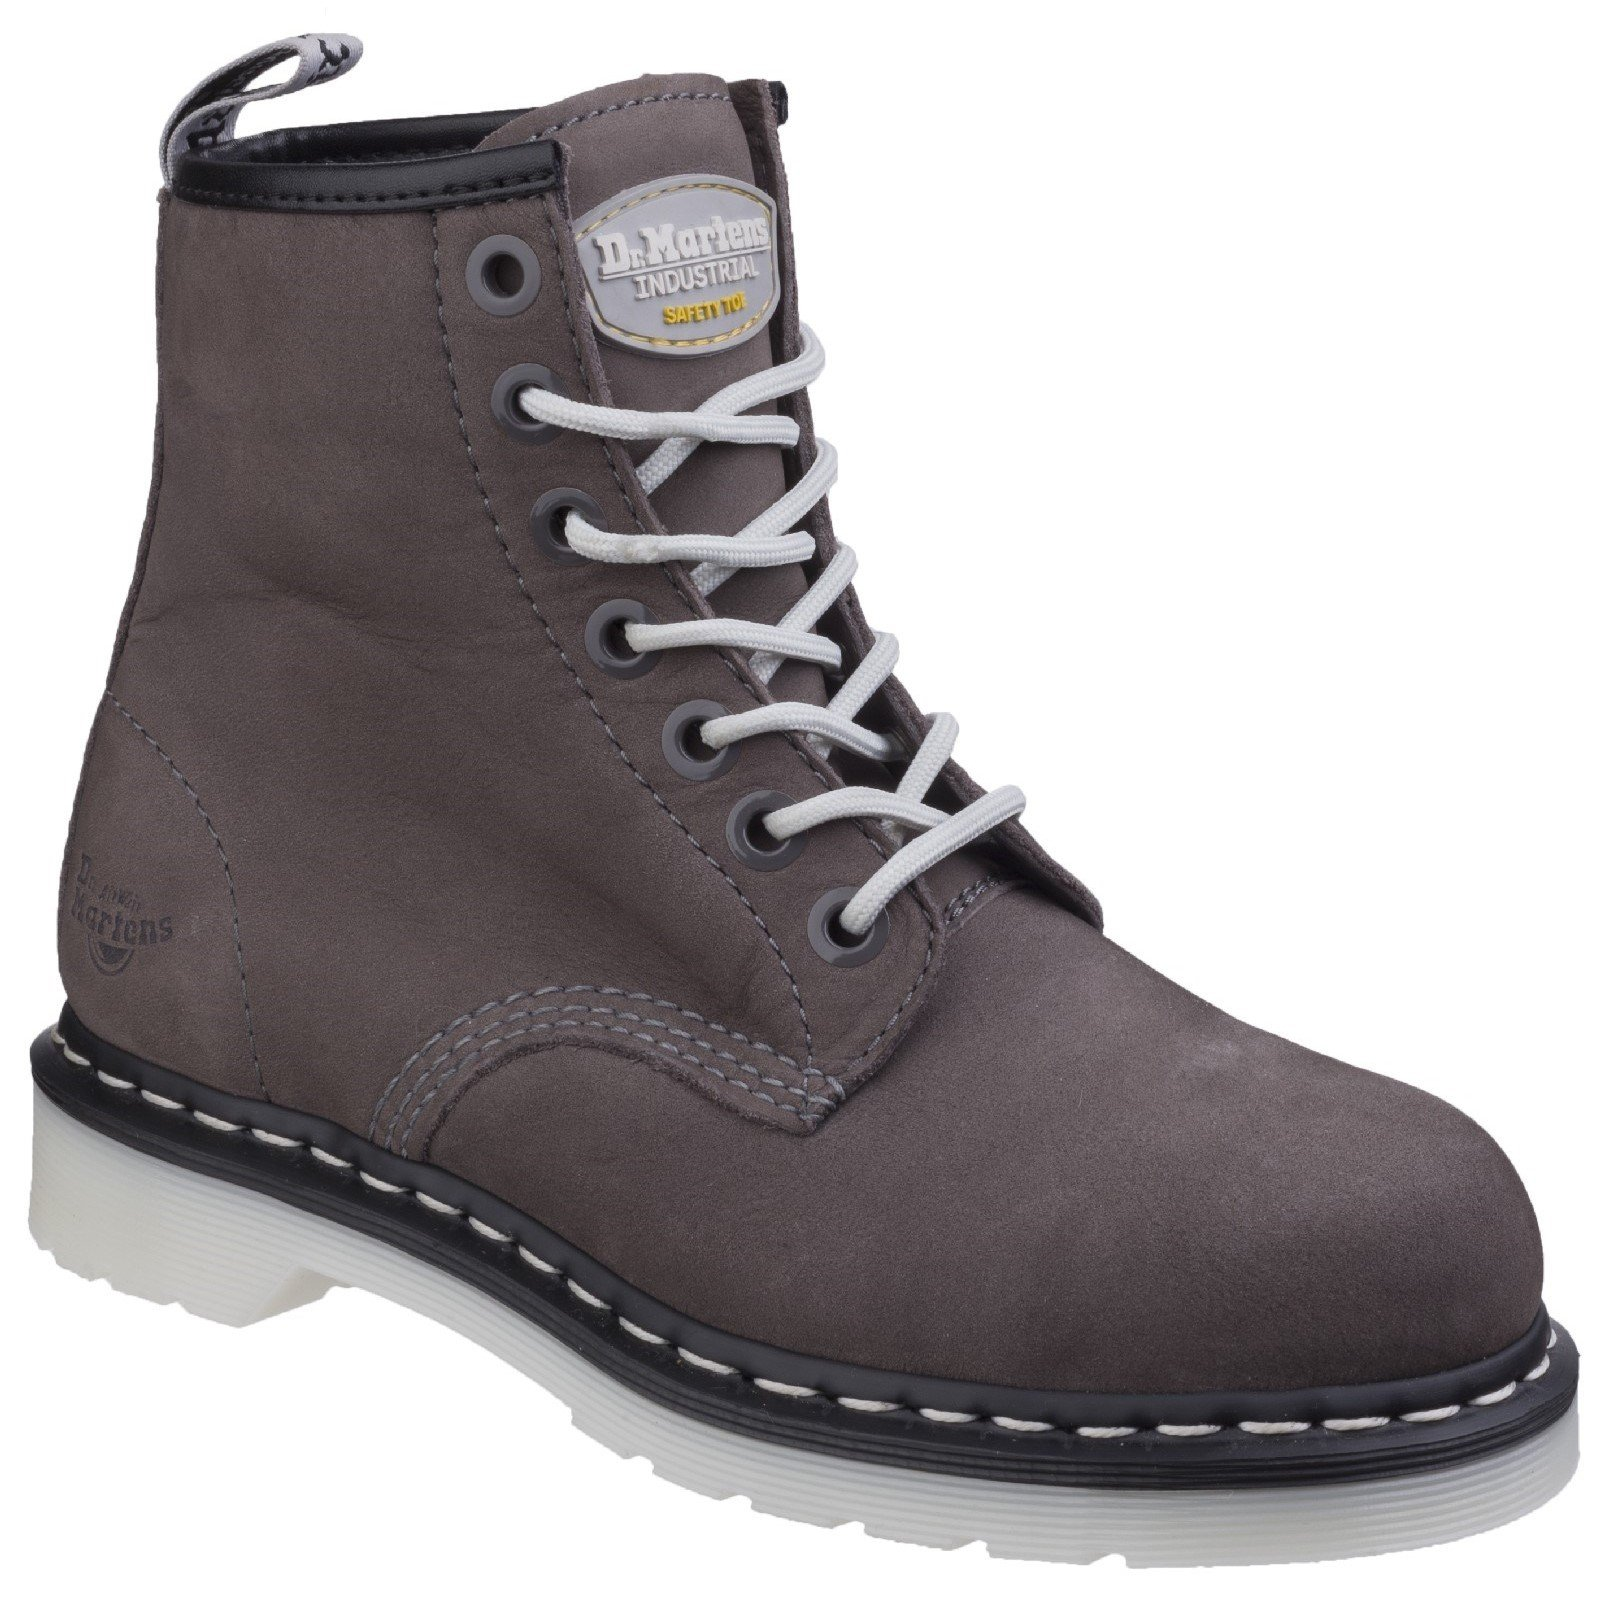 Dr Martens Women's Maple Classic Steel-Toe Work Boot Grey 26783 - Grey Wind River 6.5